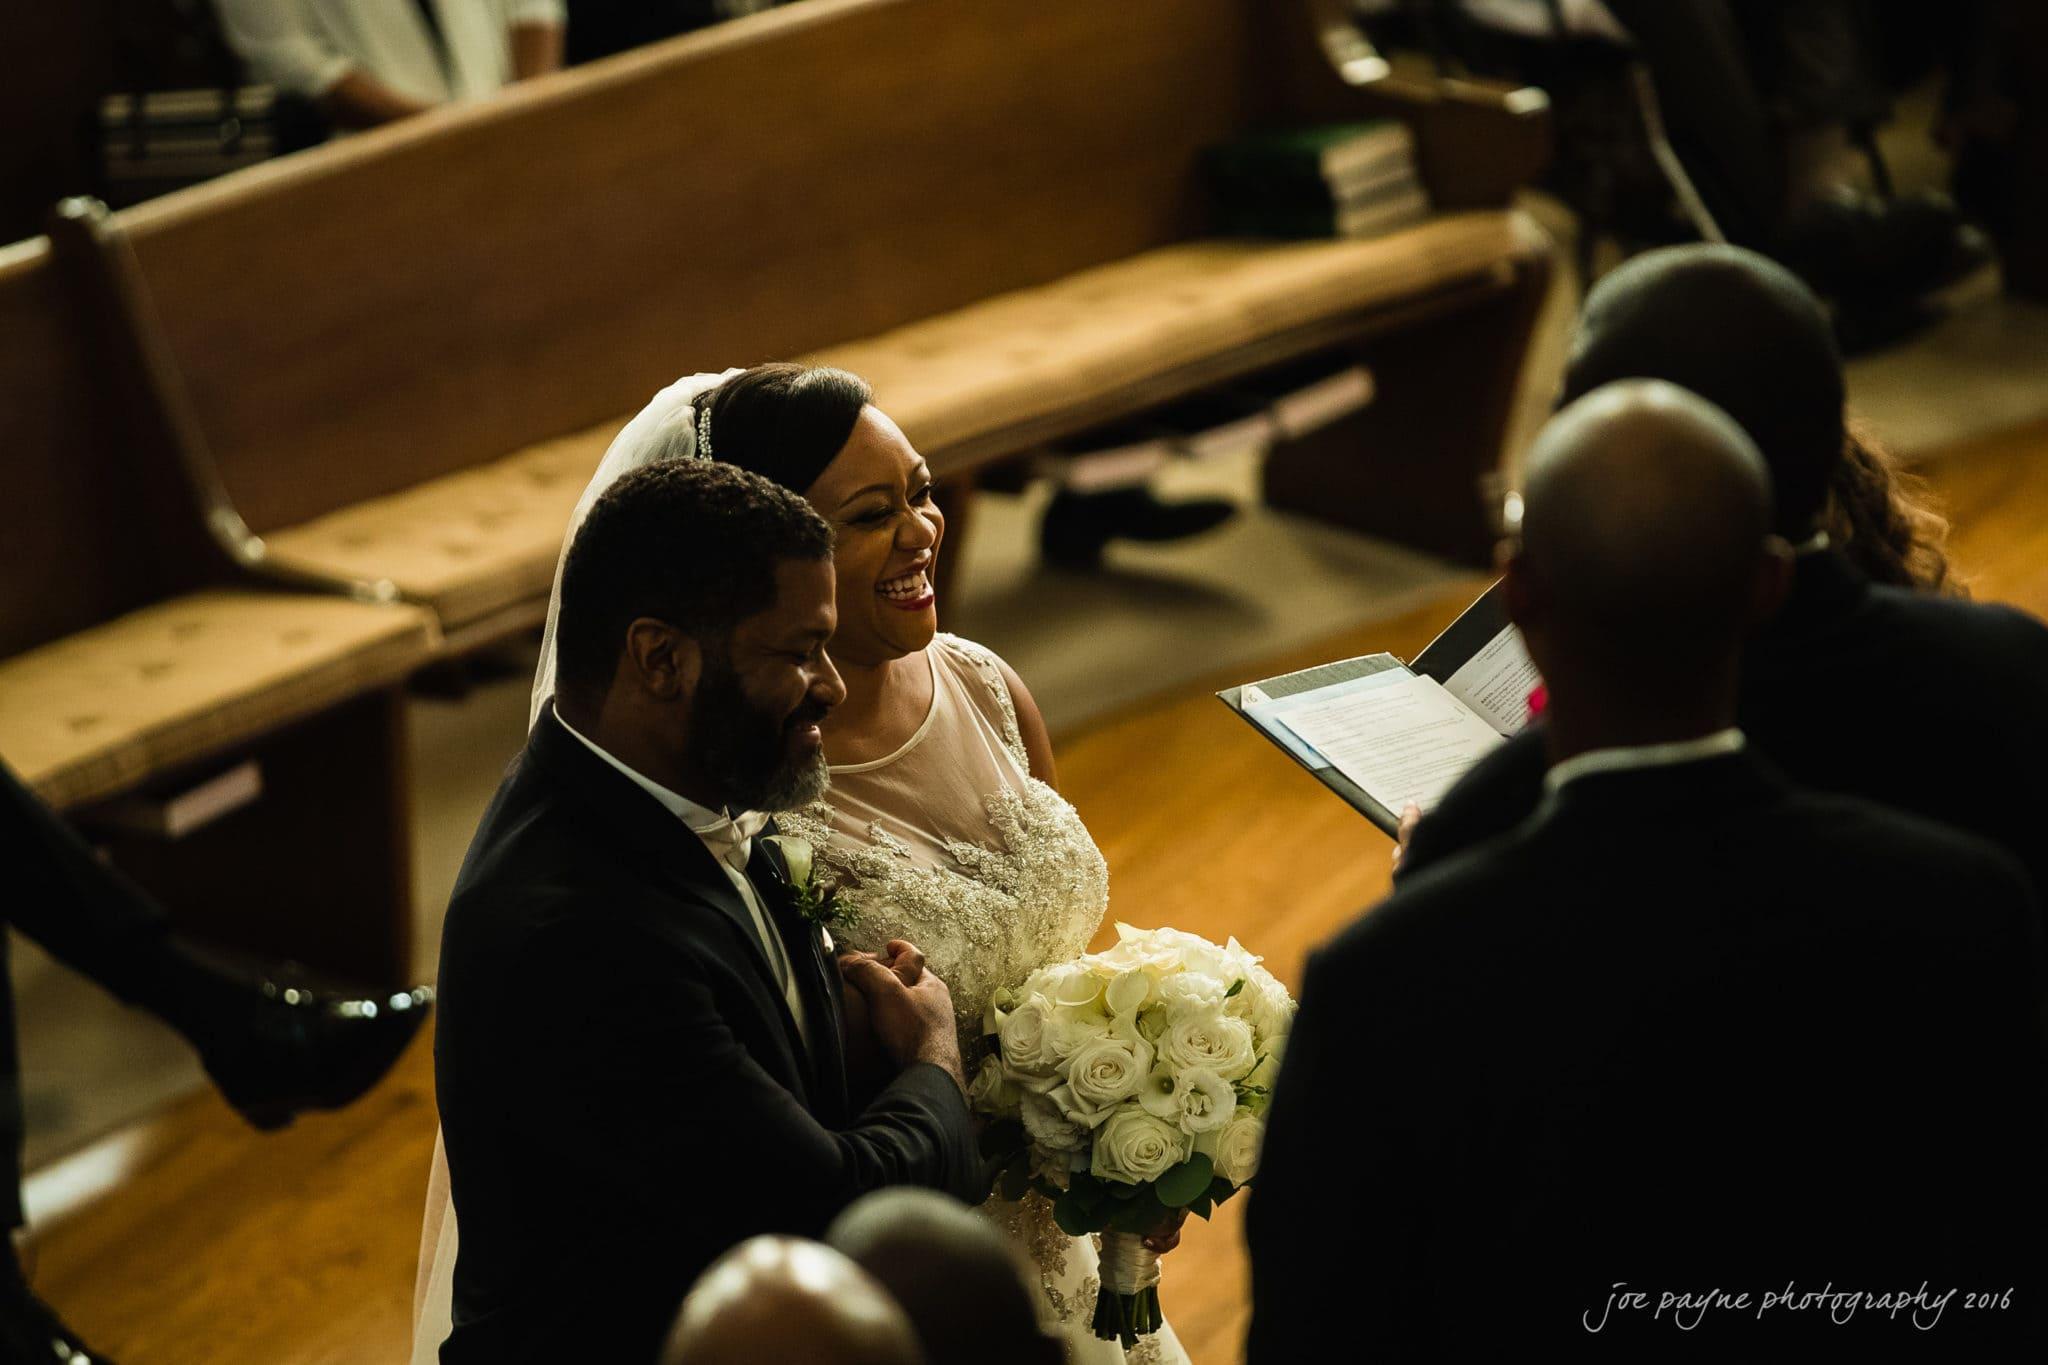 first-baptist-millennium-center-winston-salem-wedding-photography-toni-kevin-16